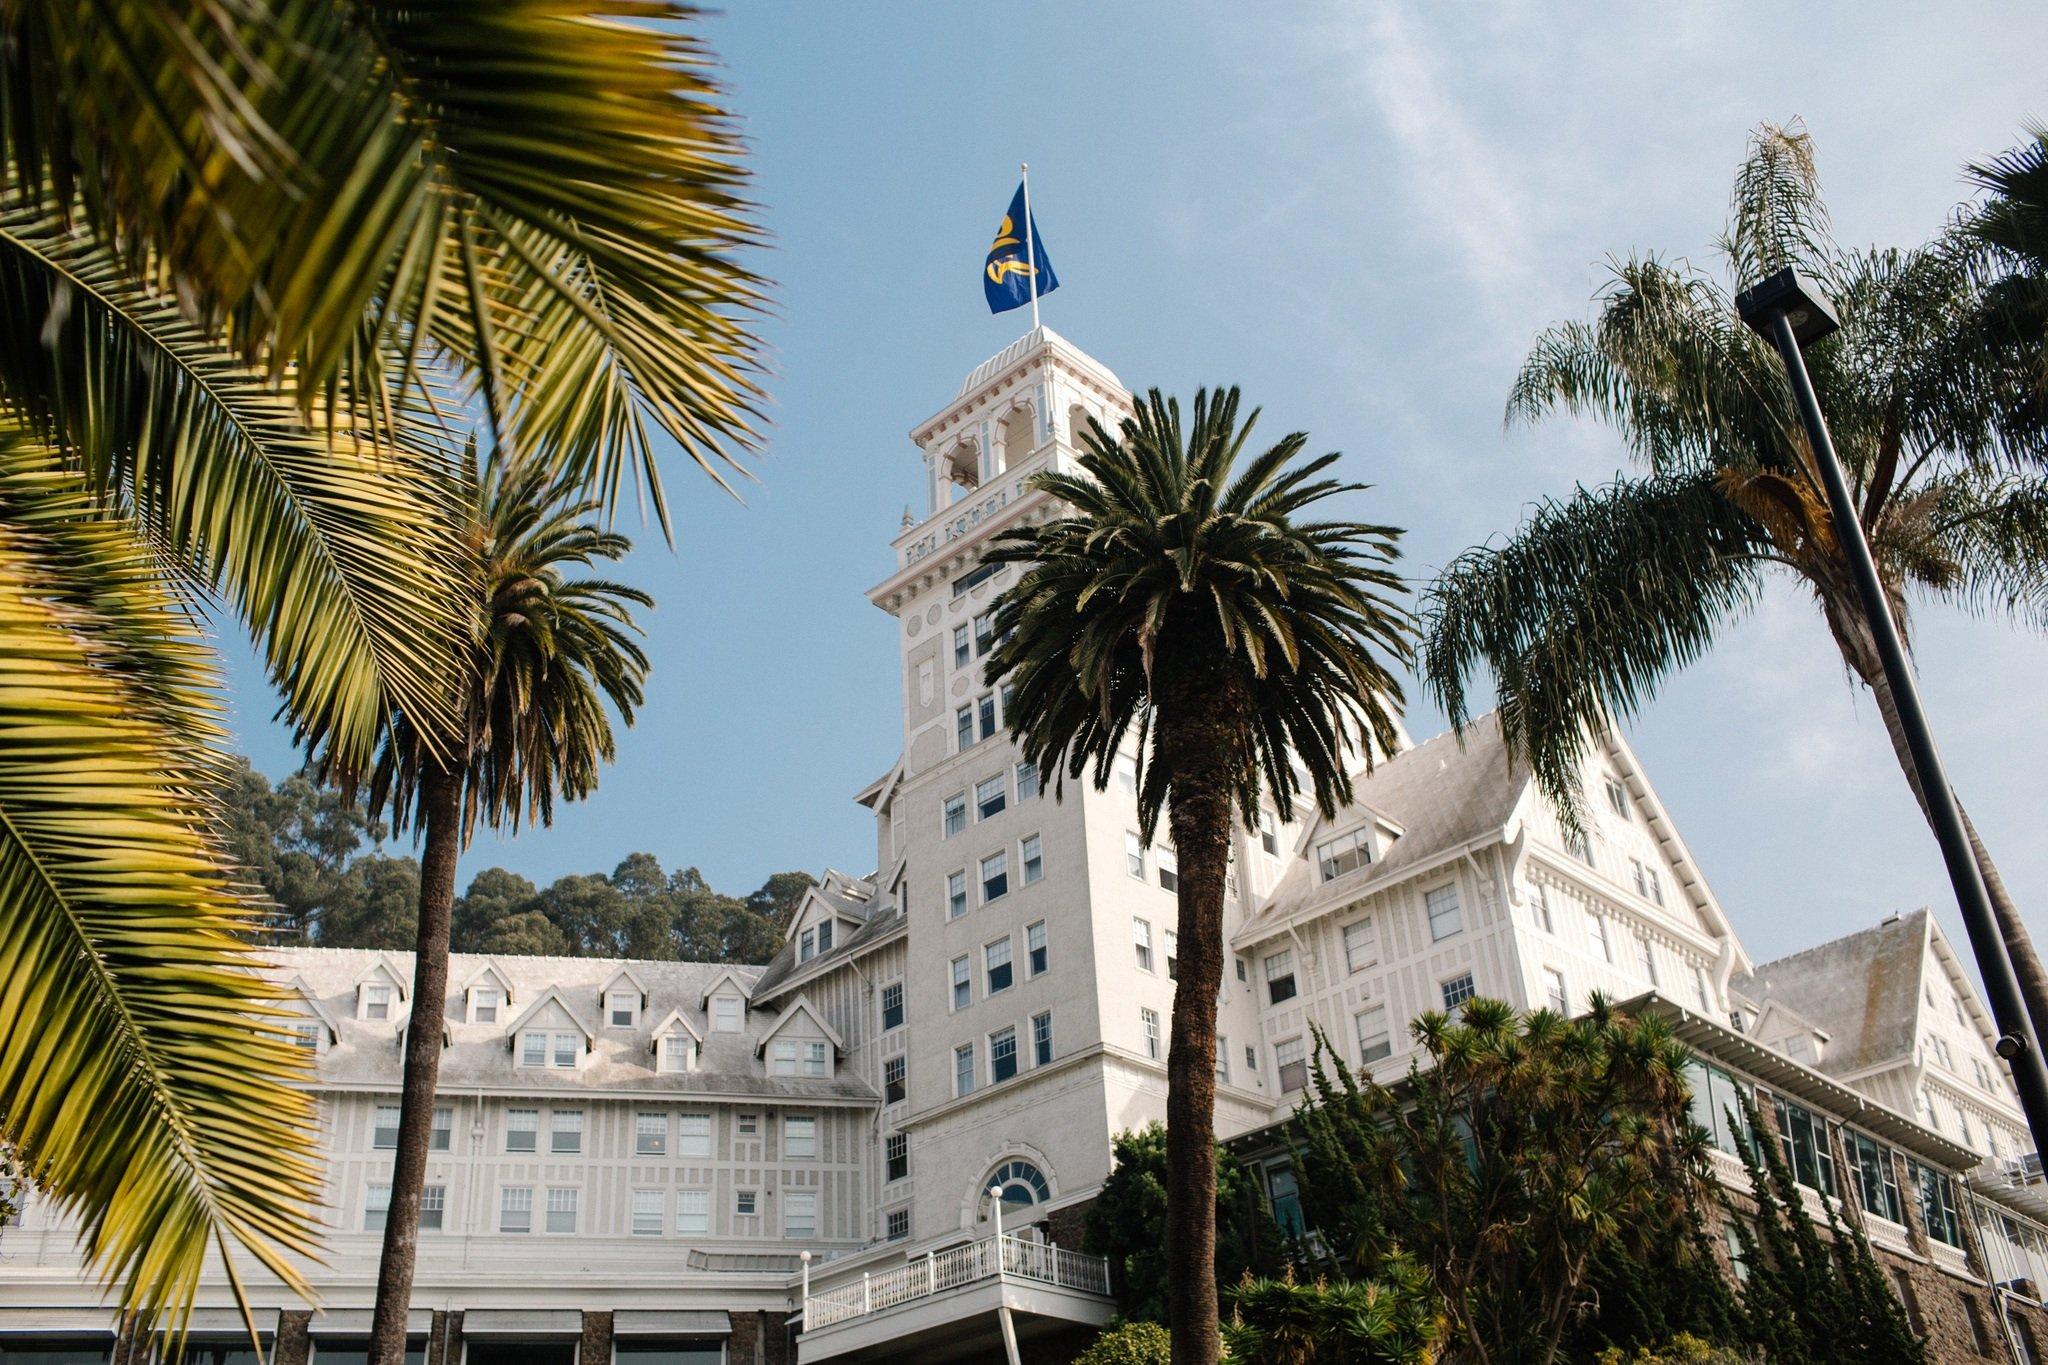 Claremont Hotel A Luxury In Berkeley